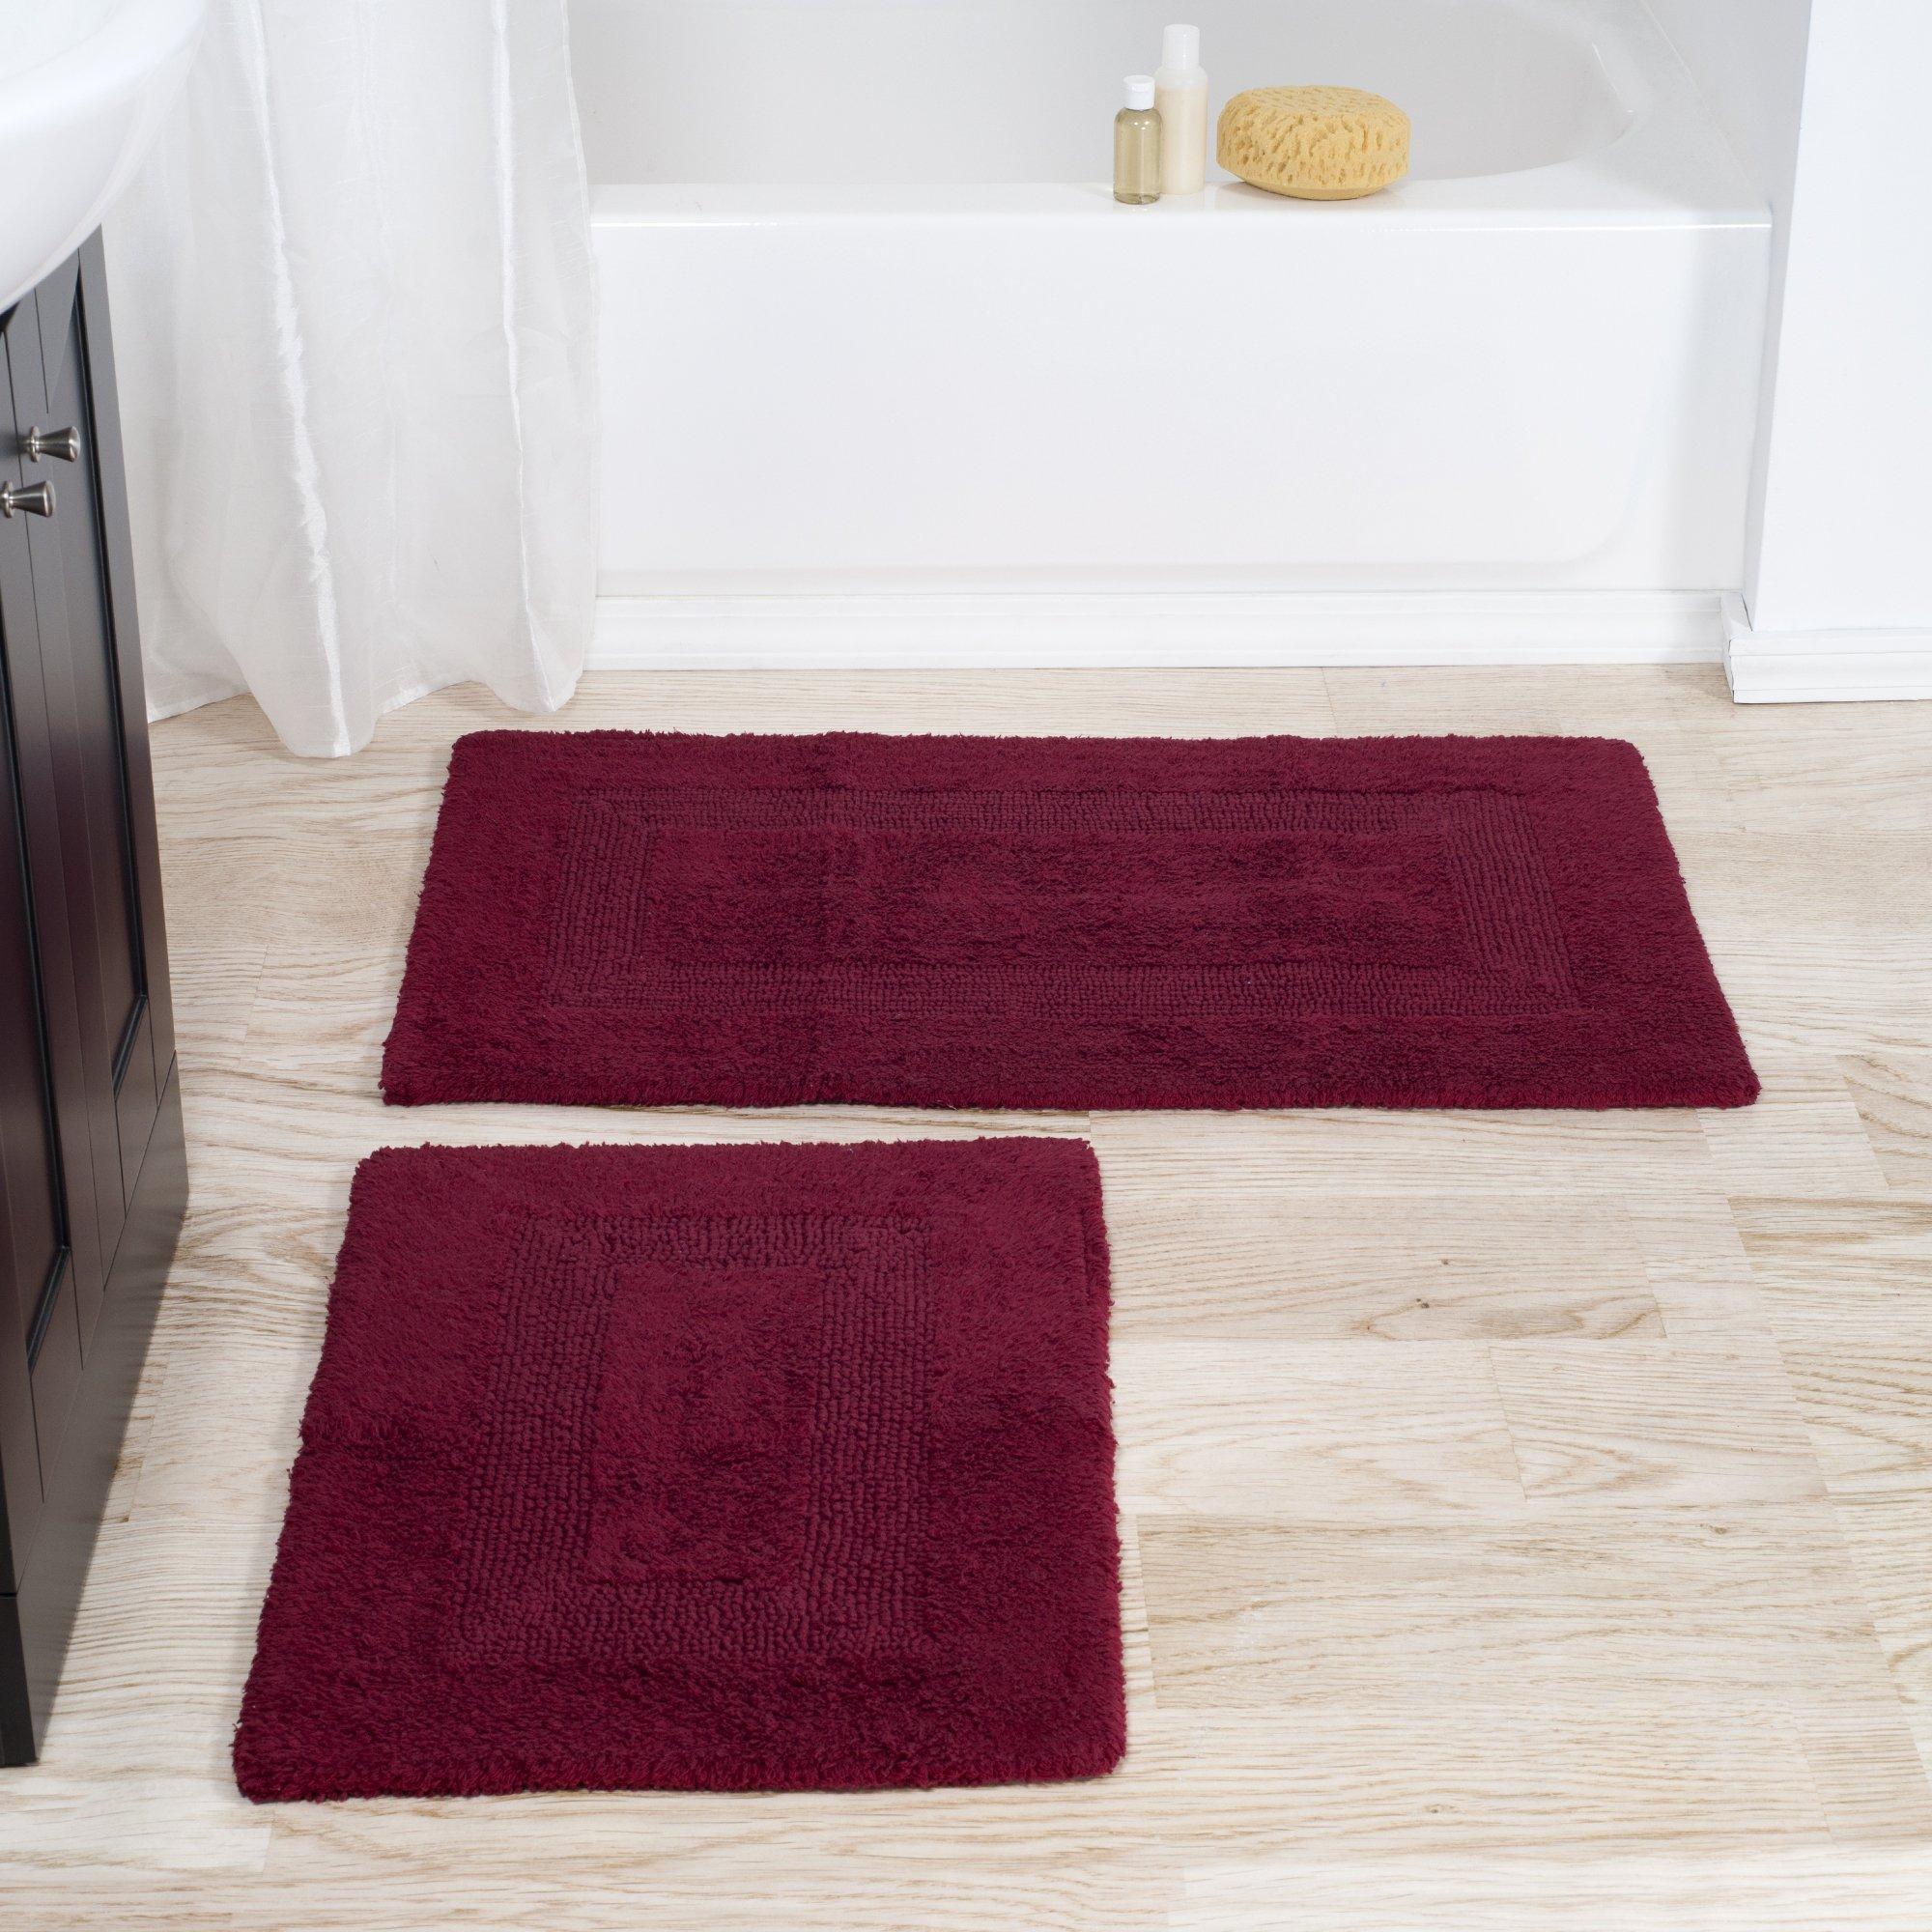 Lavish Home Cotton Bath Mat Set- 2 Piece 100 Percent Cotton Mats- Reversible, Soft, Absorbent and Machine Washable Bathroom Rugs By (Burgundy)